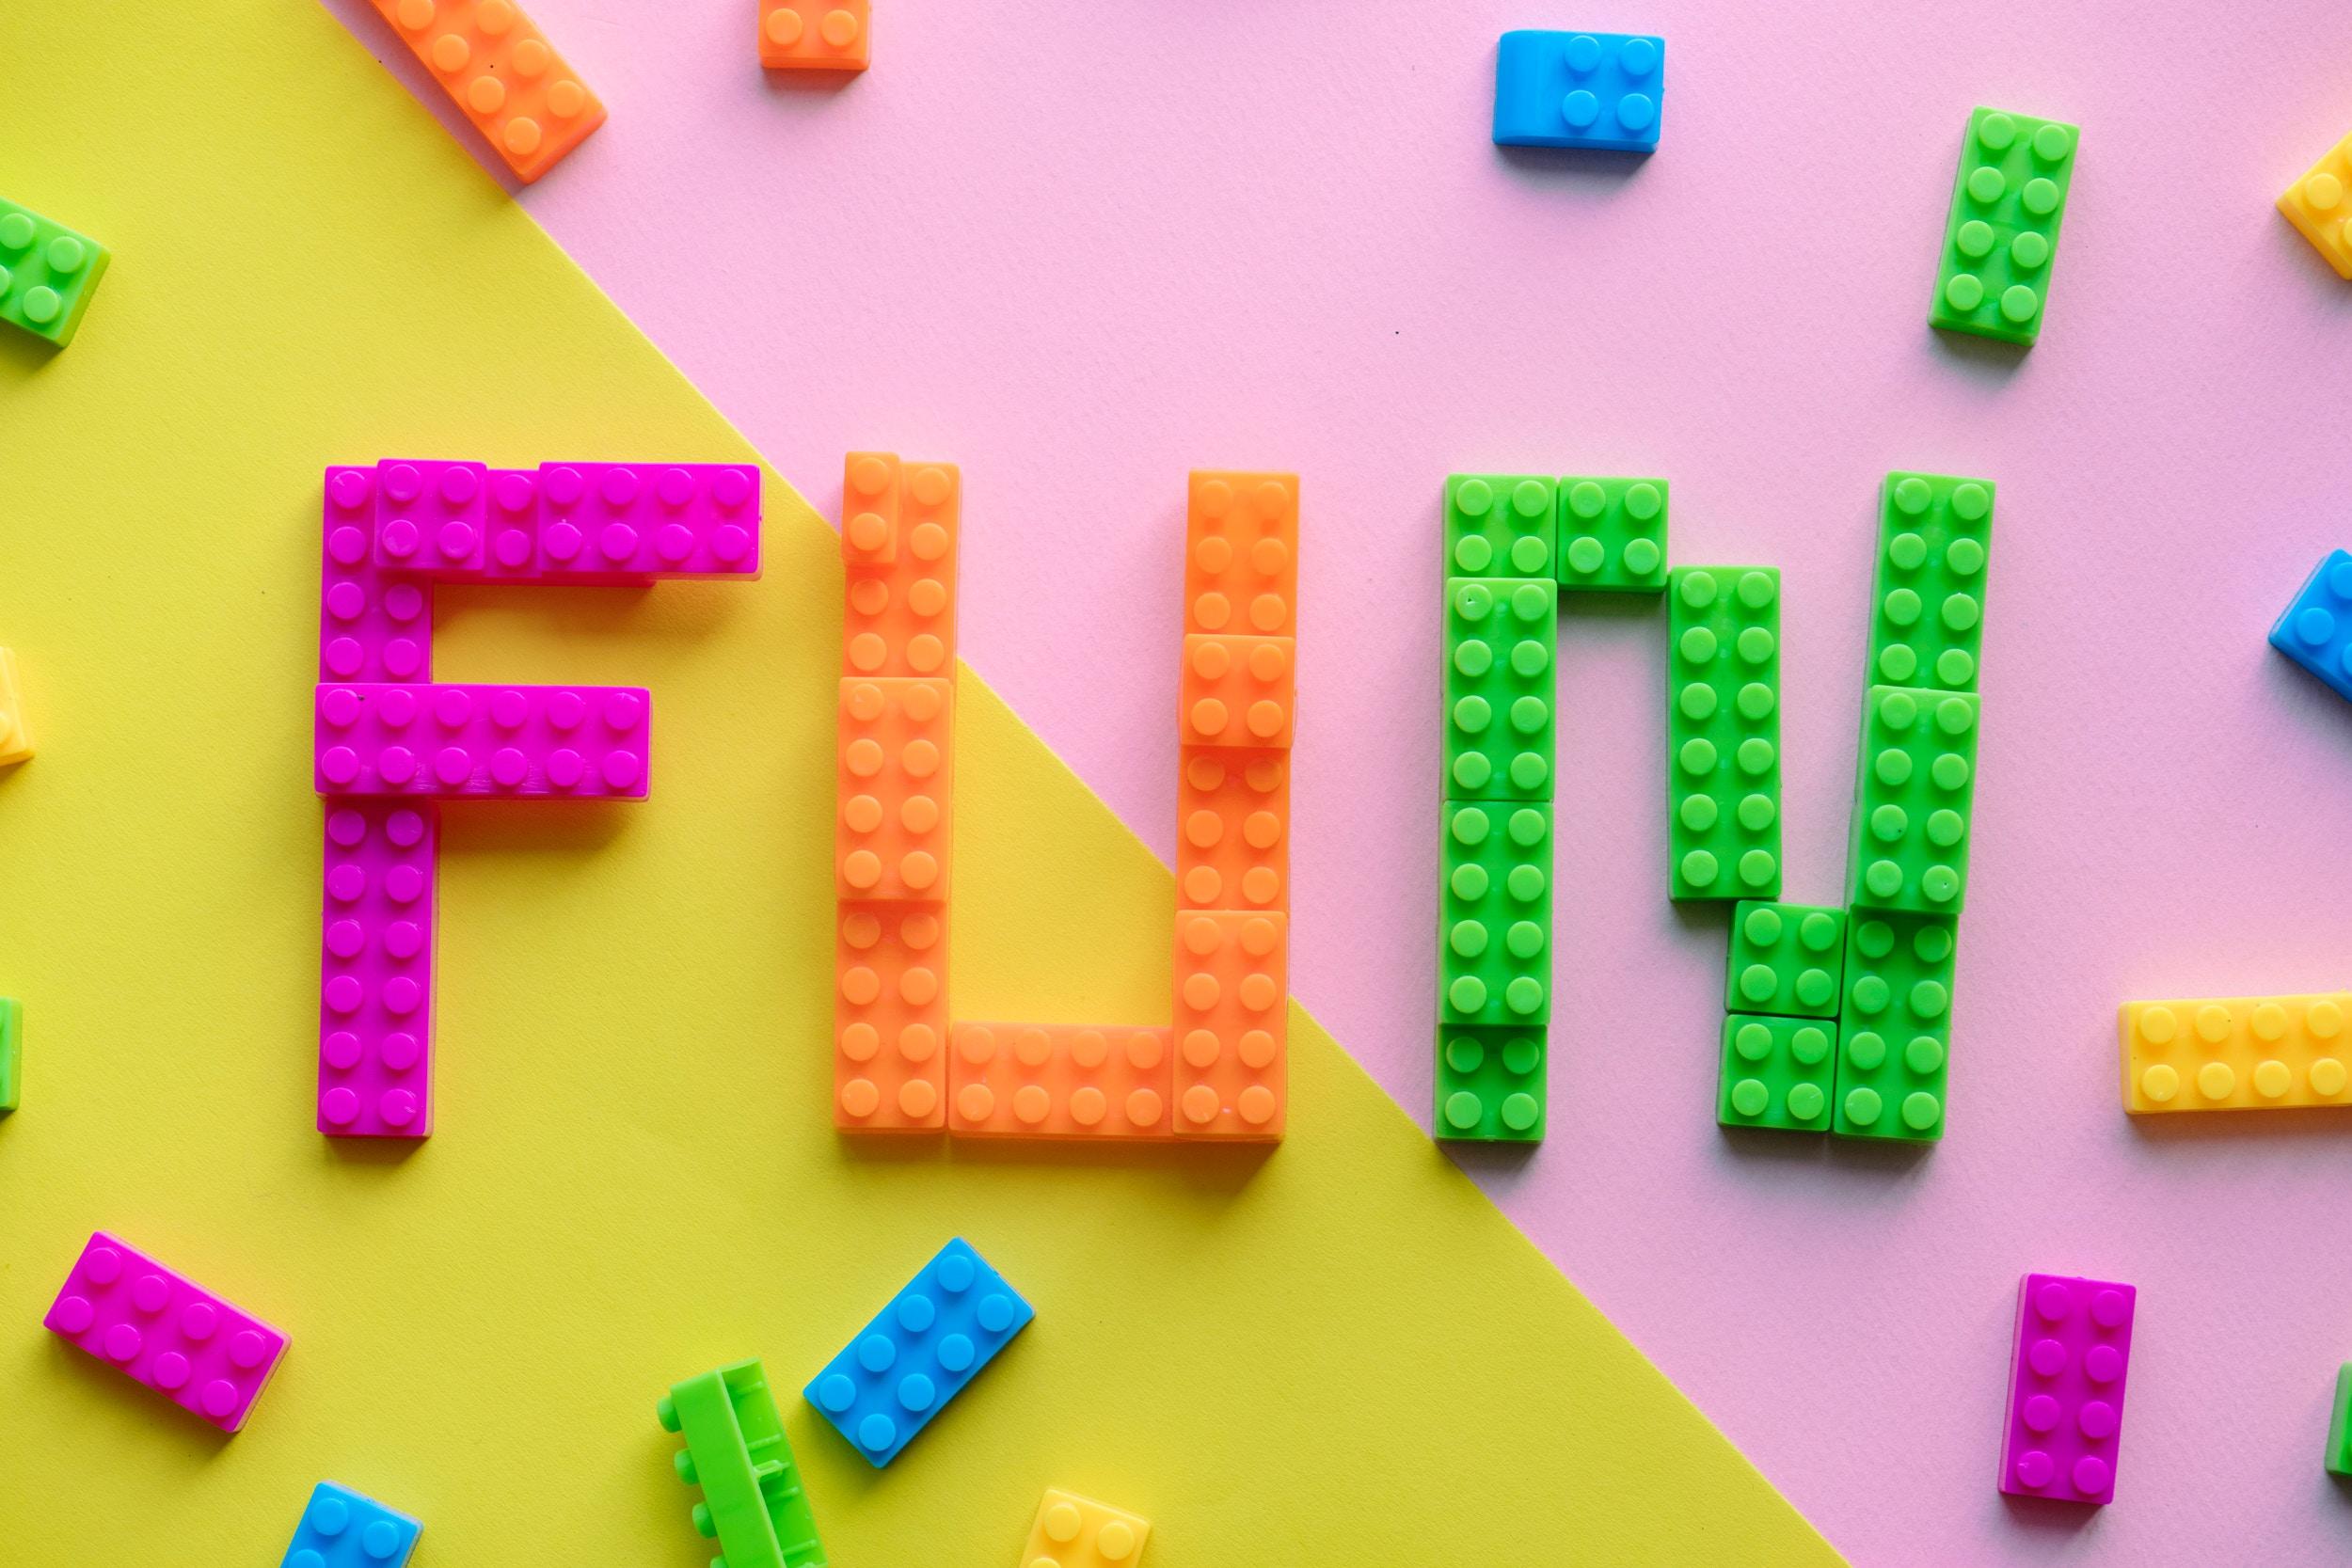 Introducing-Kids-to-Math-Through-Manipulatives